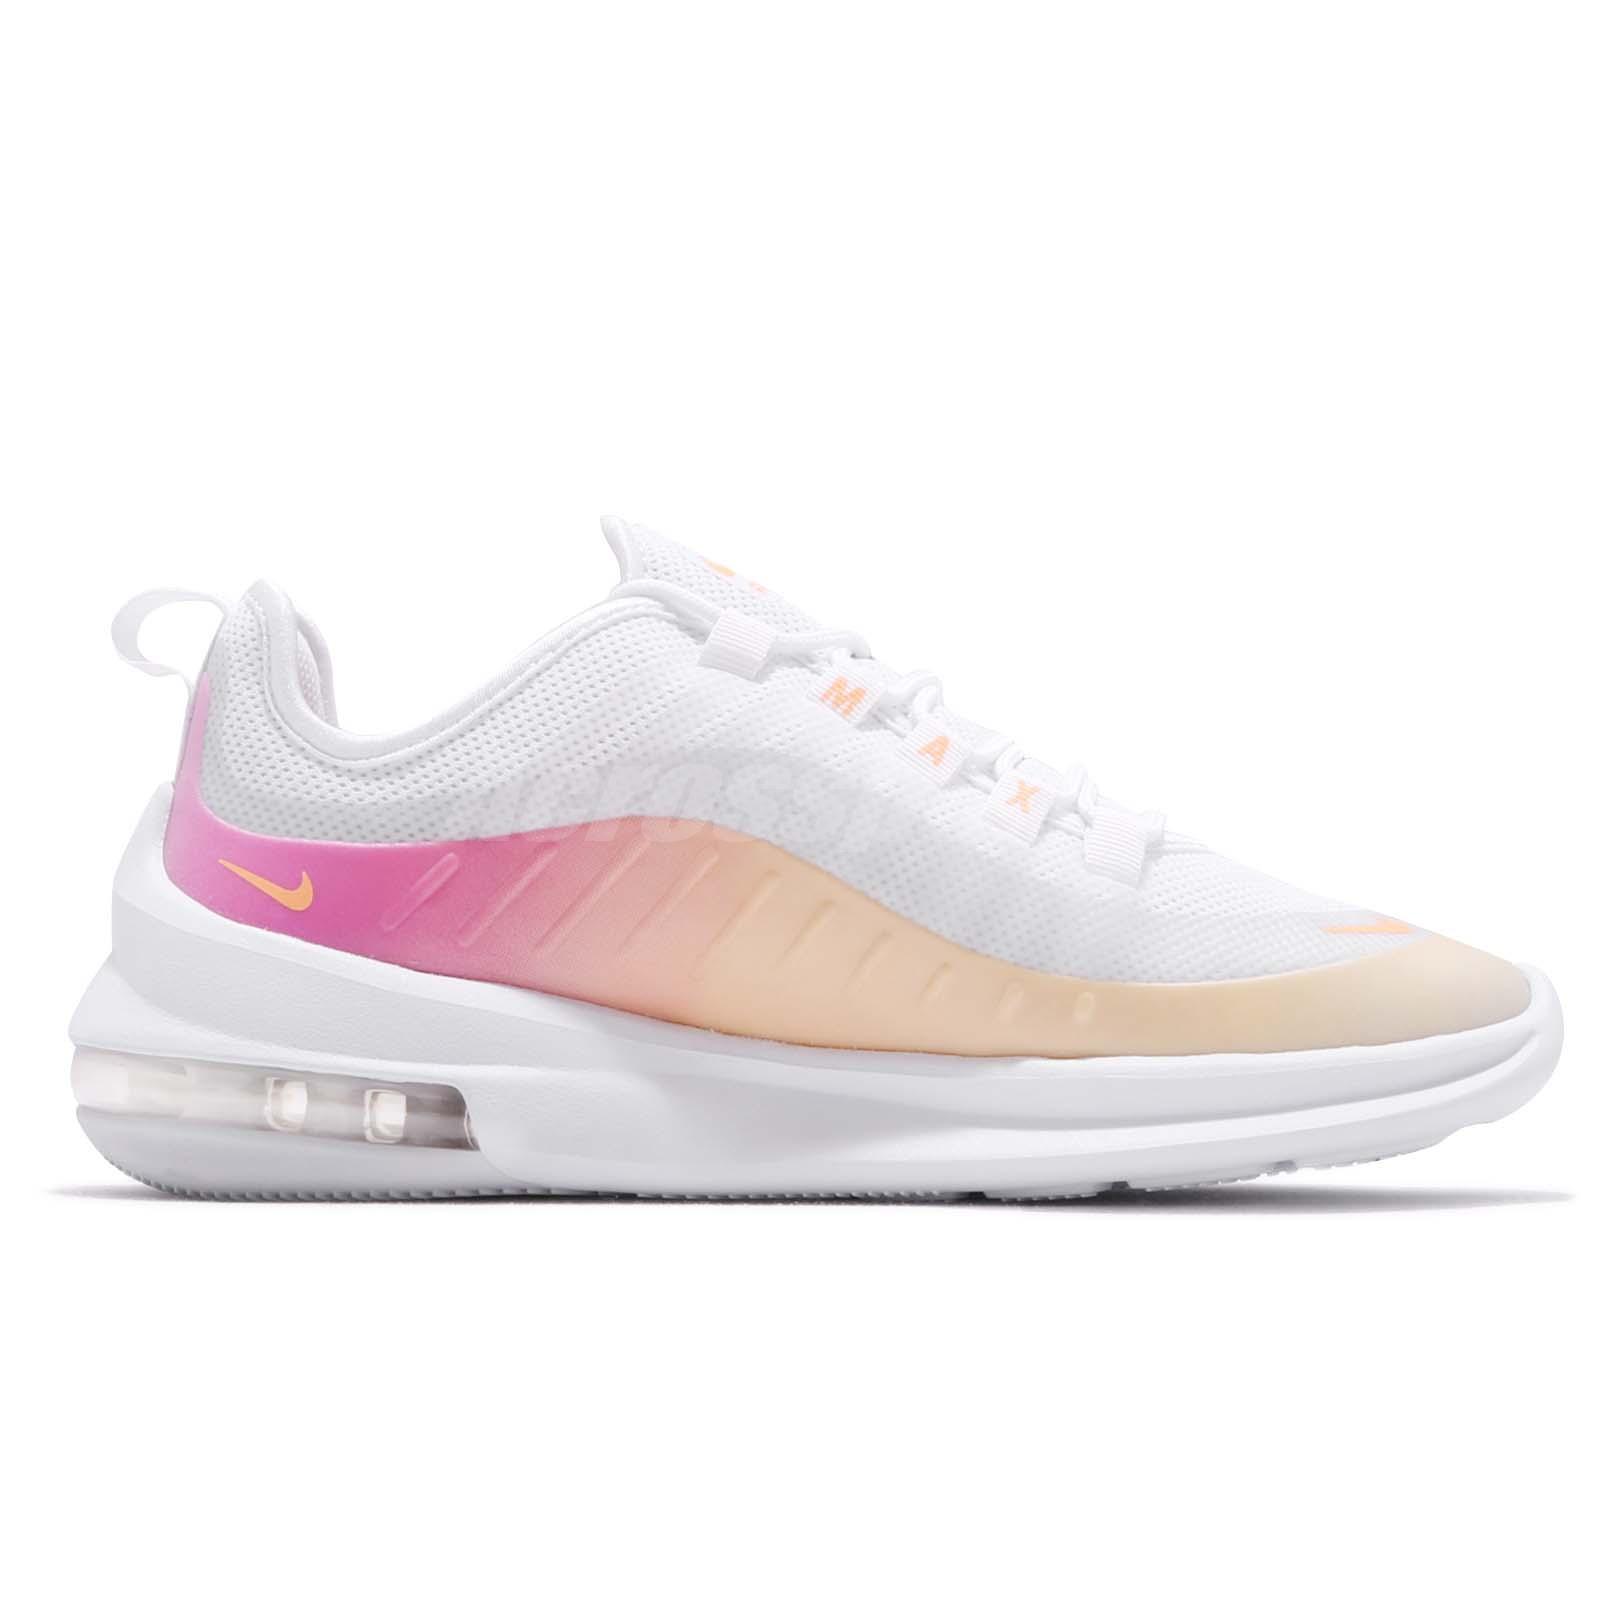 Detalles acerca de Nike Mujeres Air Max Eje Prem Blanco melón tinte láser Fucsia Zapato de mujer BQ0126 101 mostrar título original